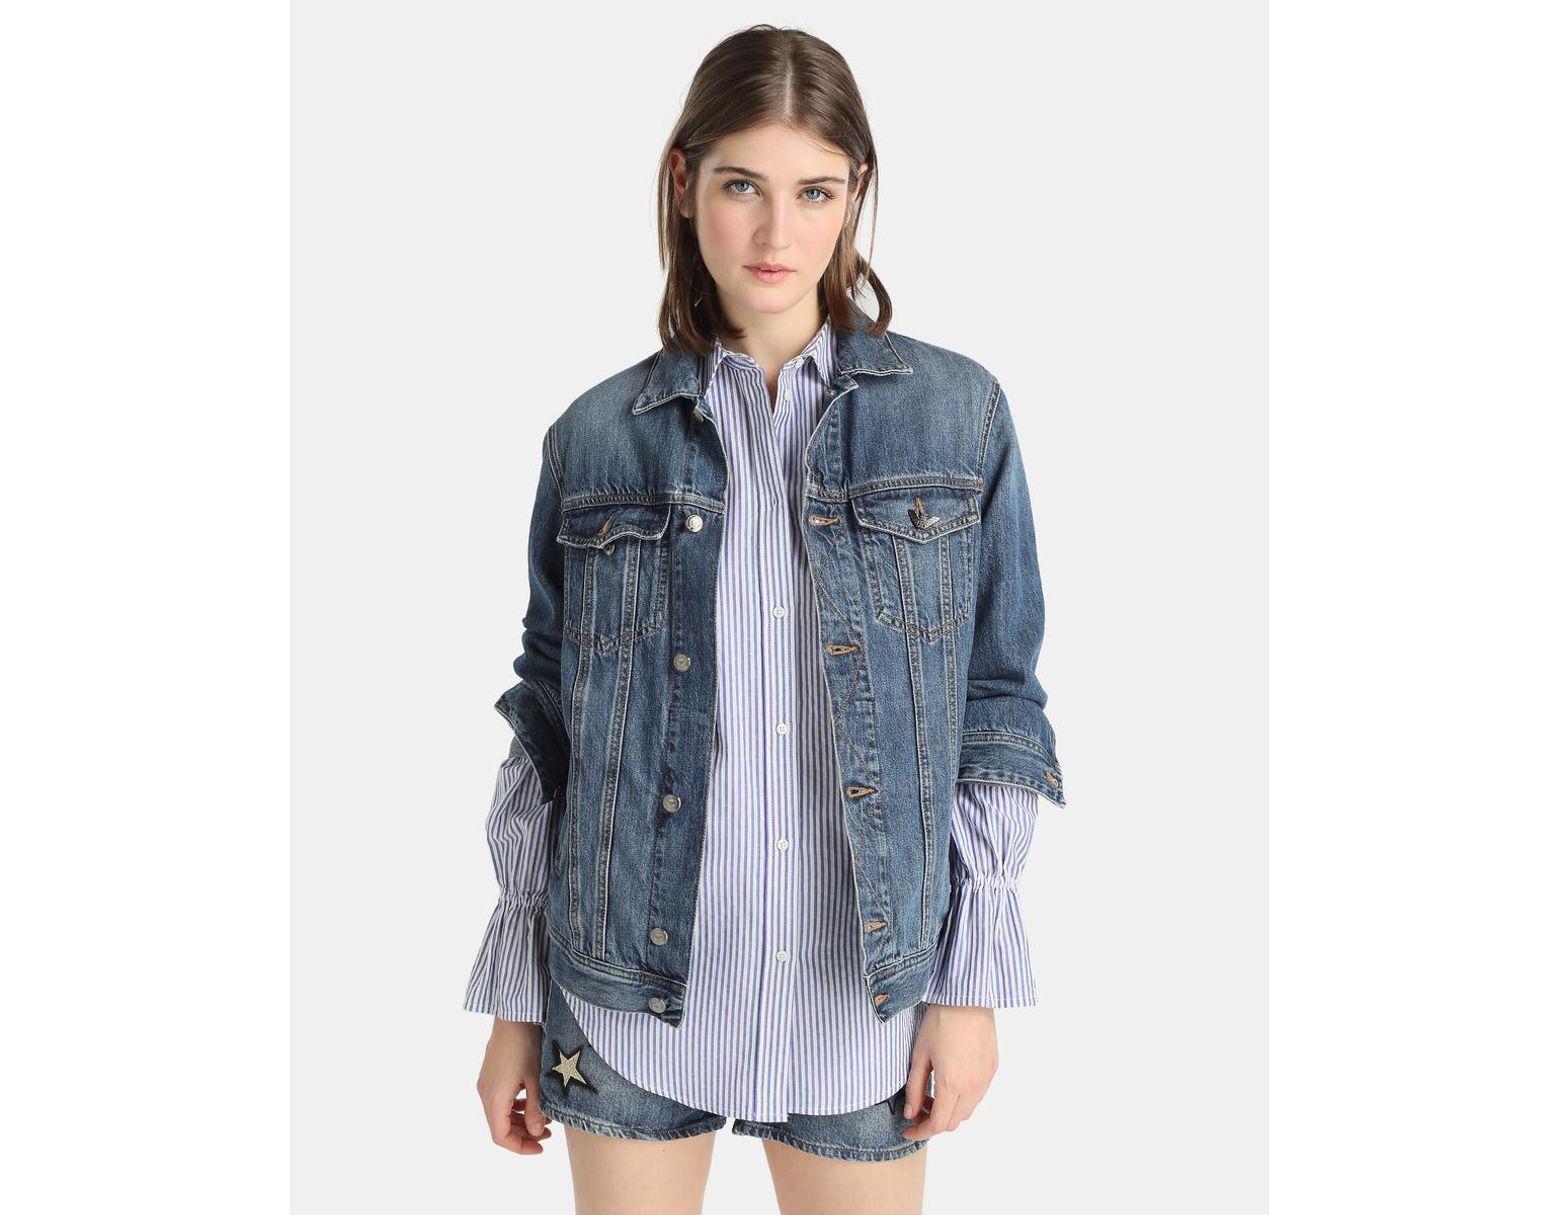 détaillant en ligne 681f9 9cdbe Women's Blue Veste En Jean Oversize Femme